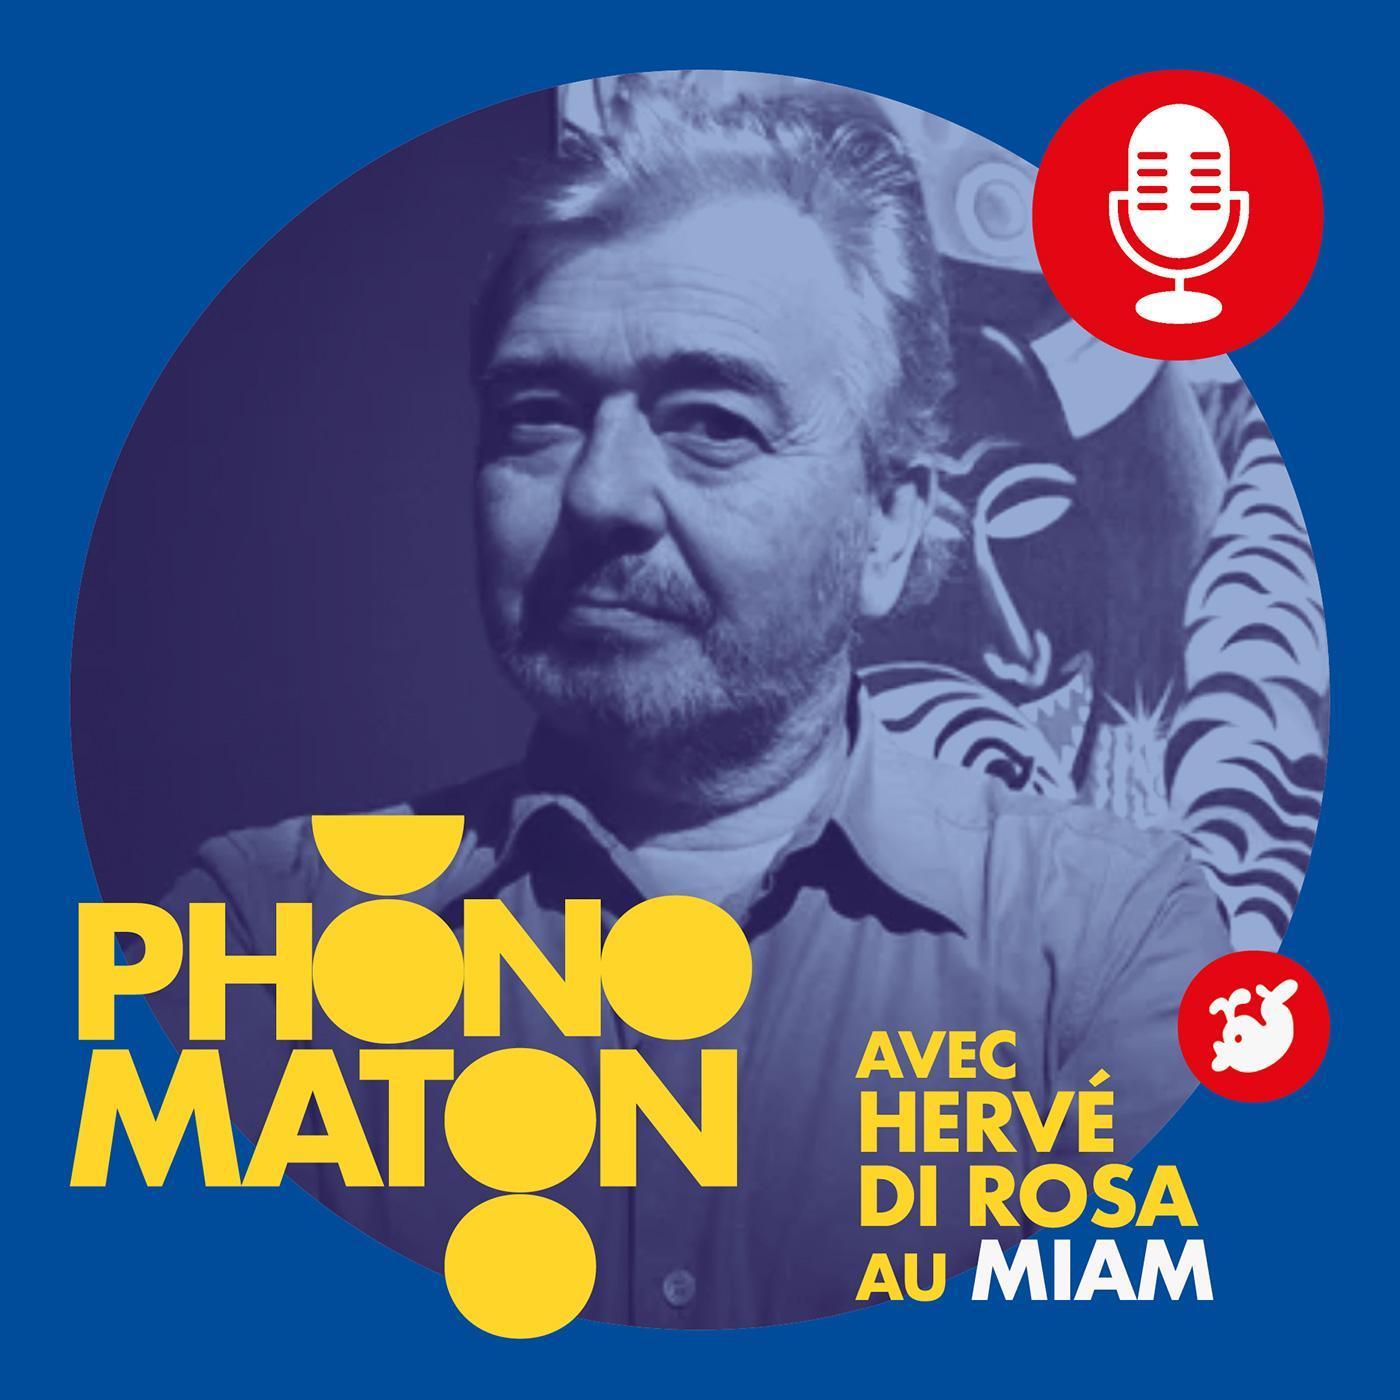 Phonomaton avec Hervé Di Rosa au MIAM